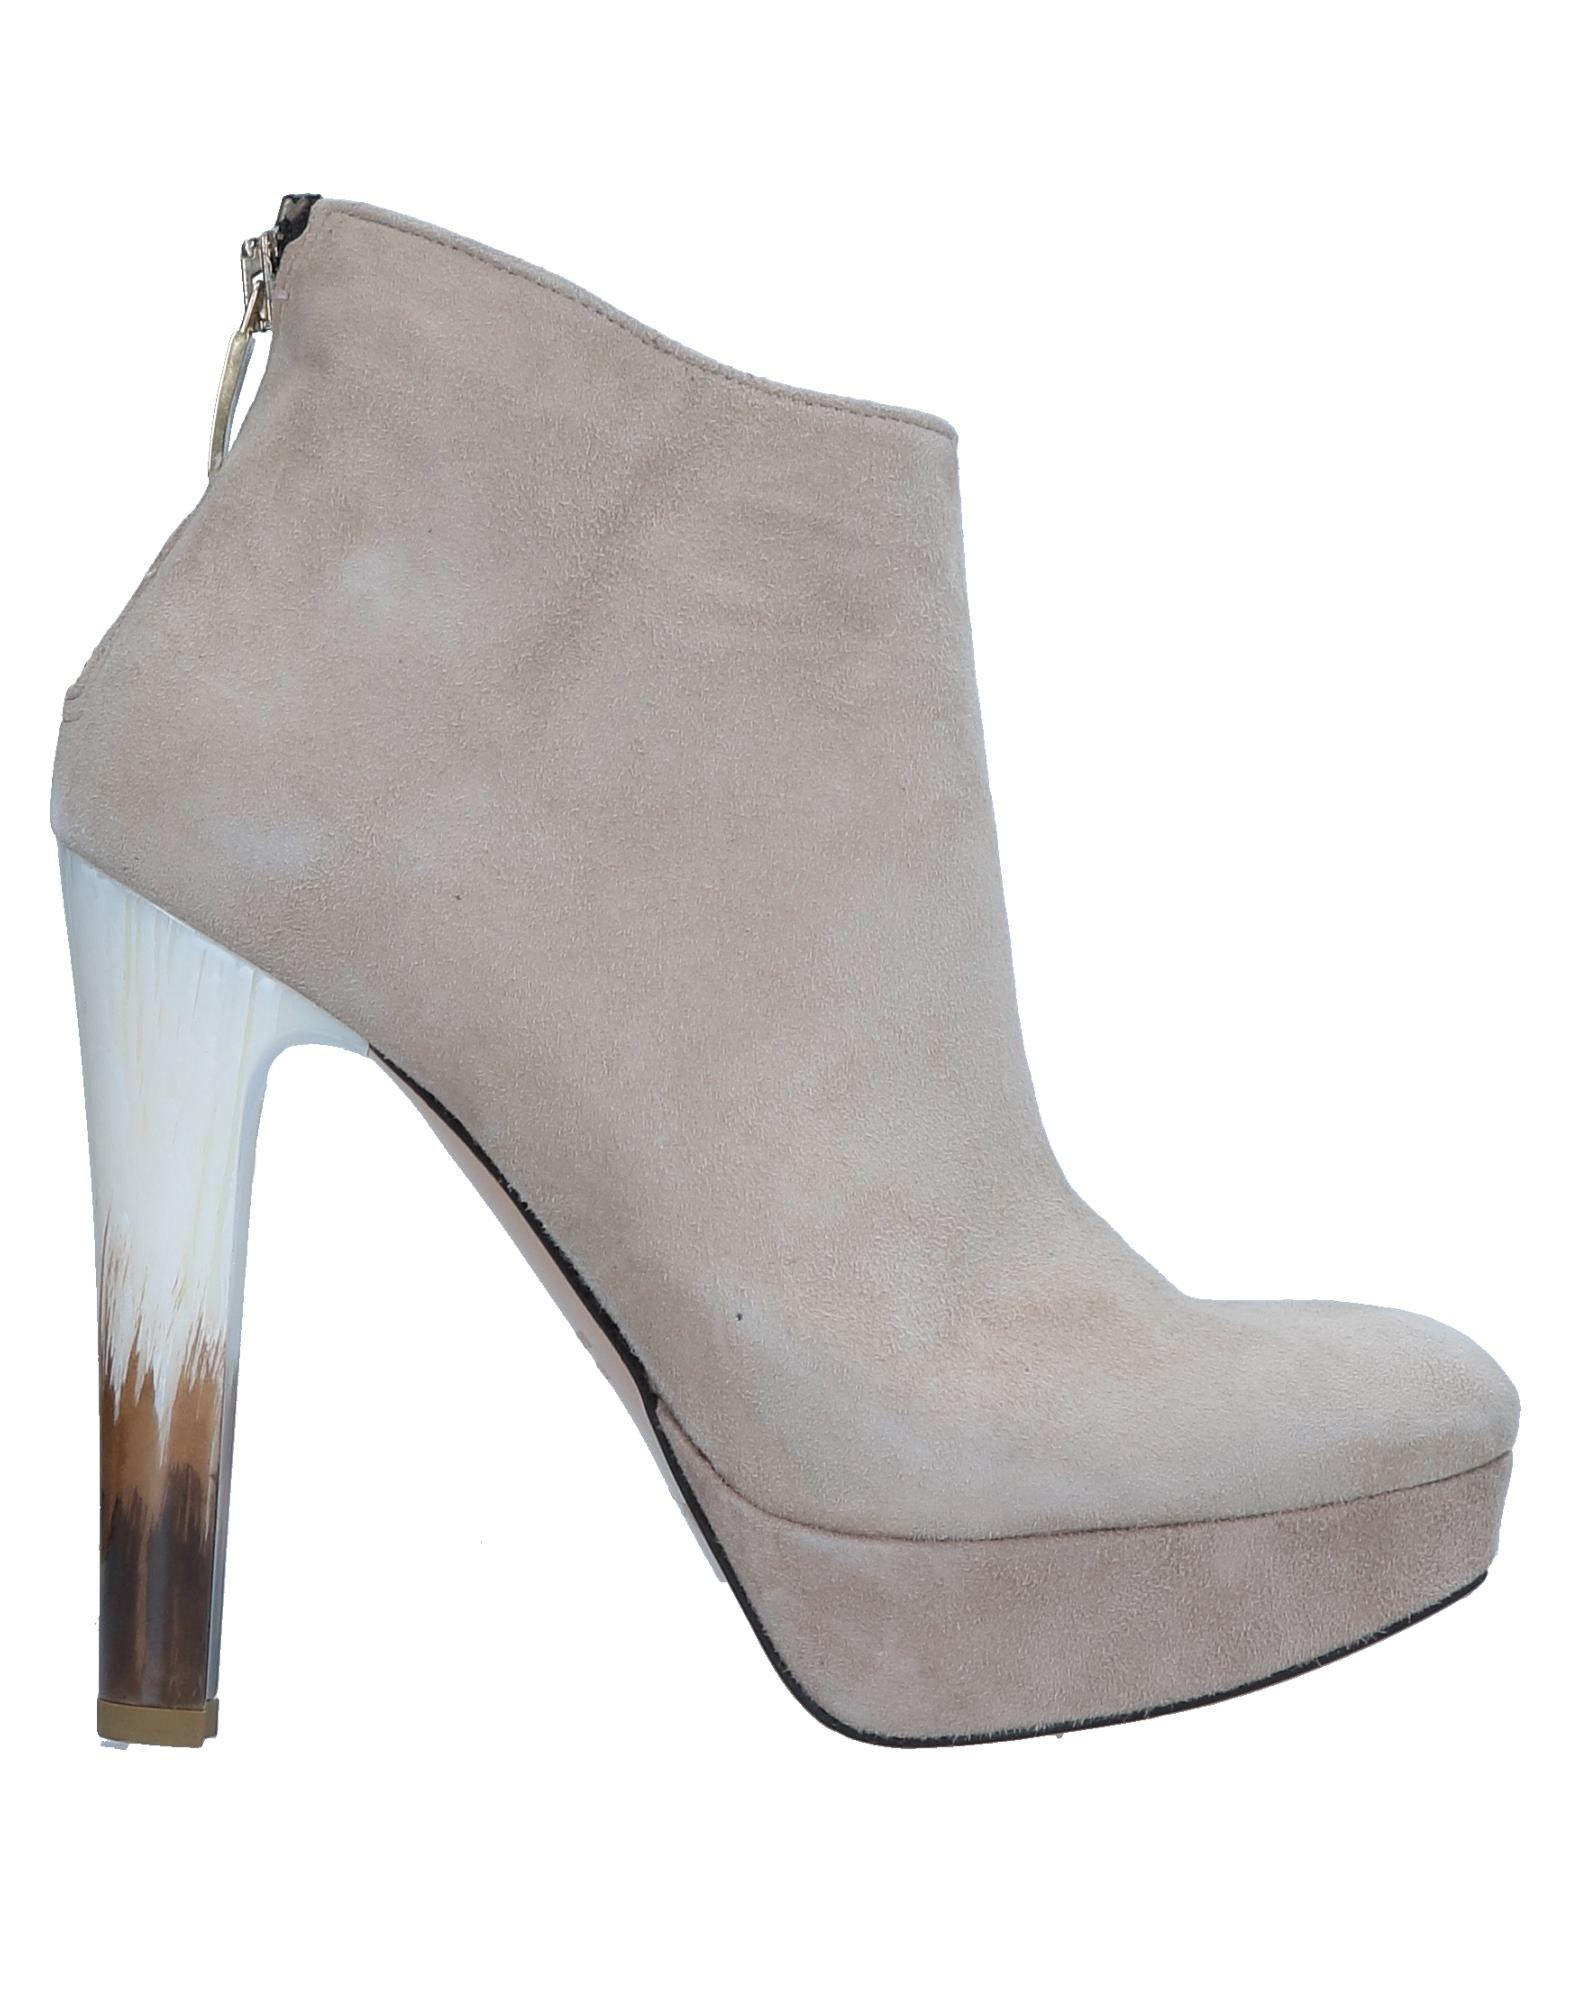 Rabatt Schuhe Chiara 11550649AX Ferragni Stiefelette Damen  11550649AX Chiara c8a50f